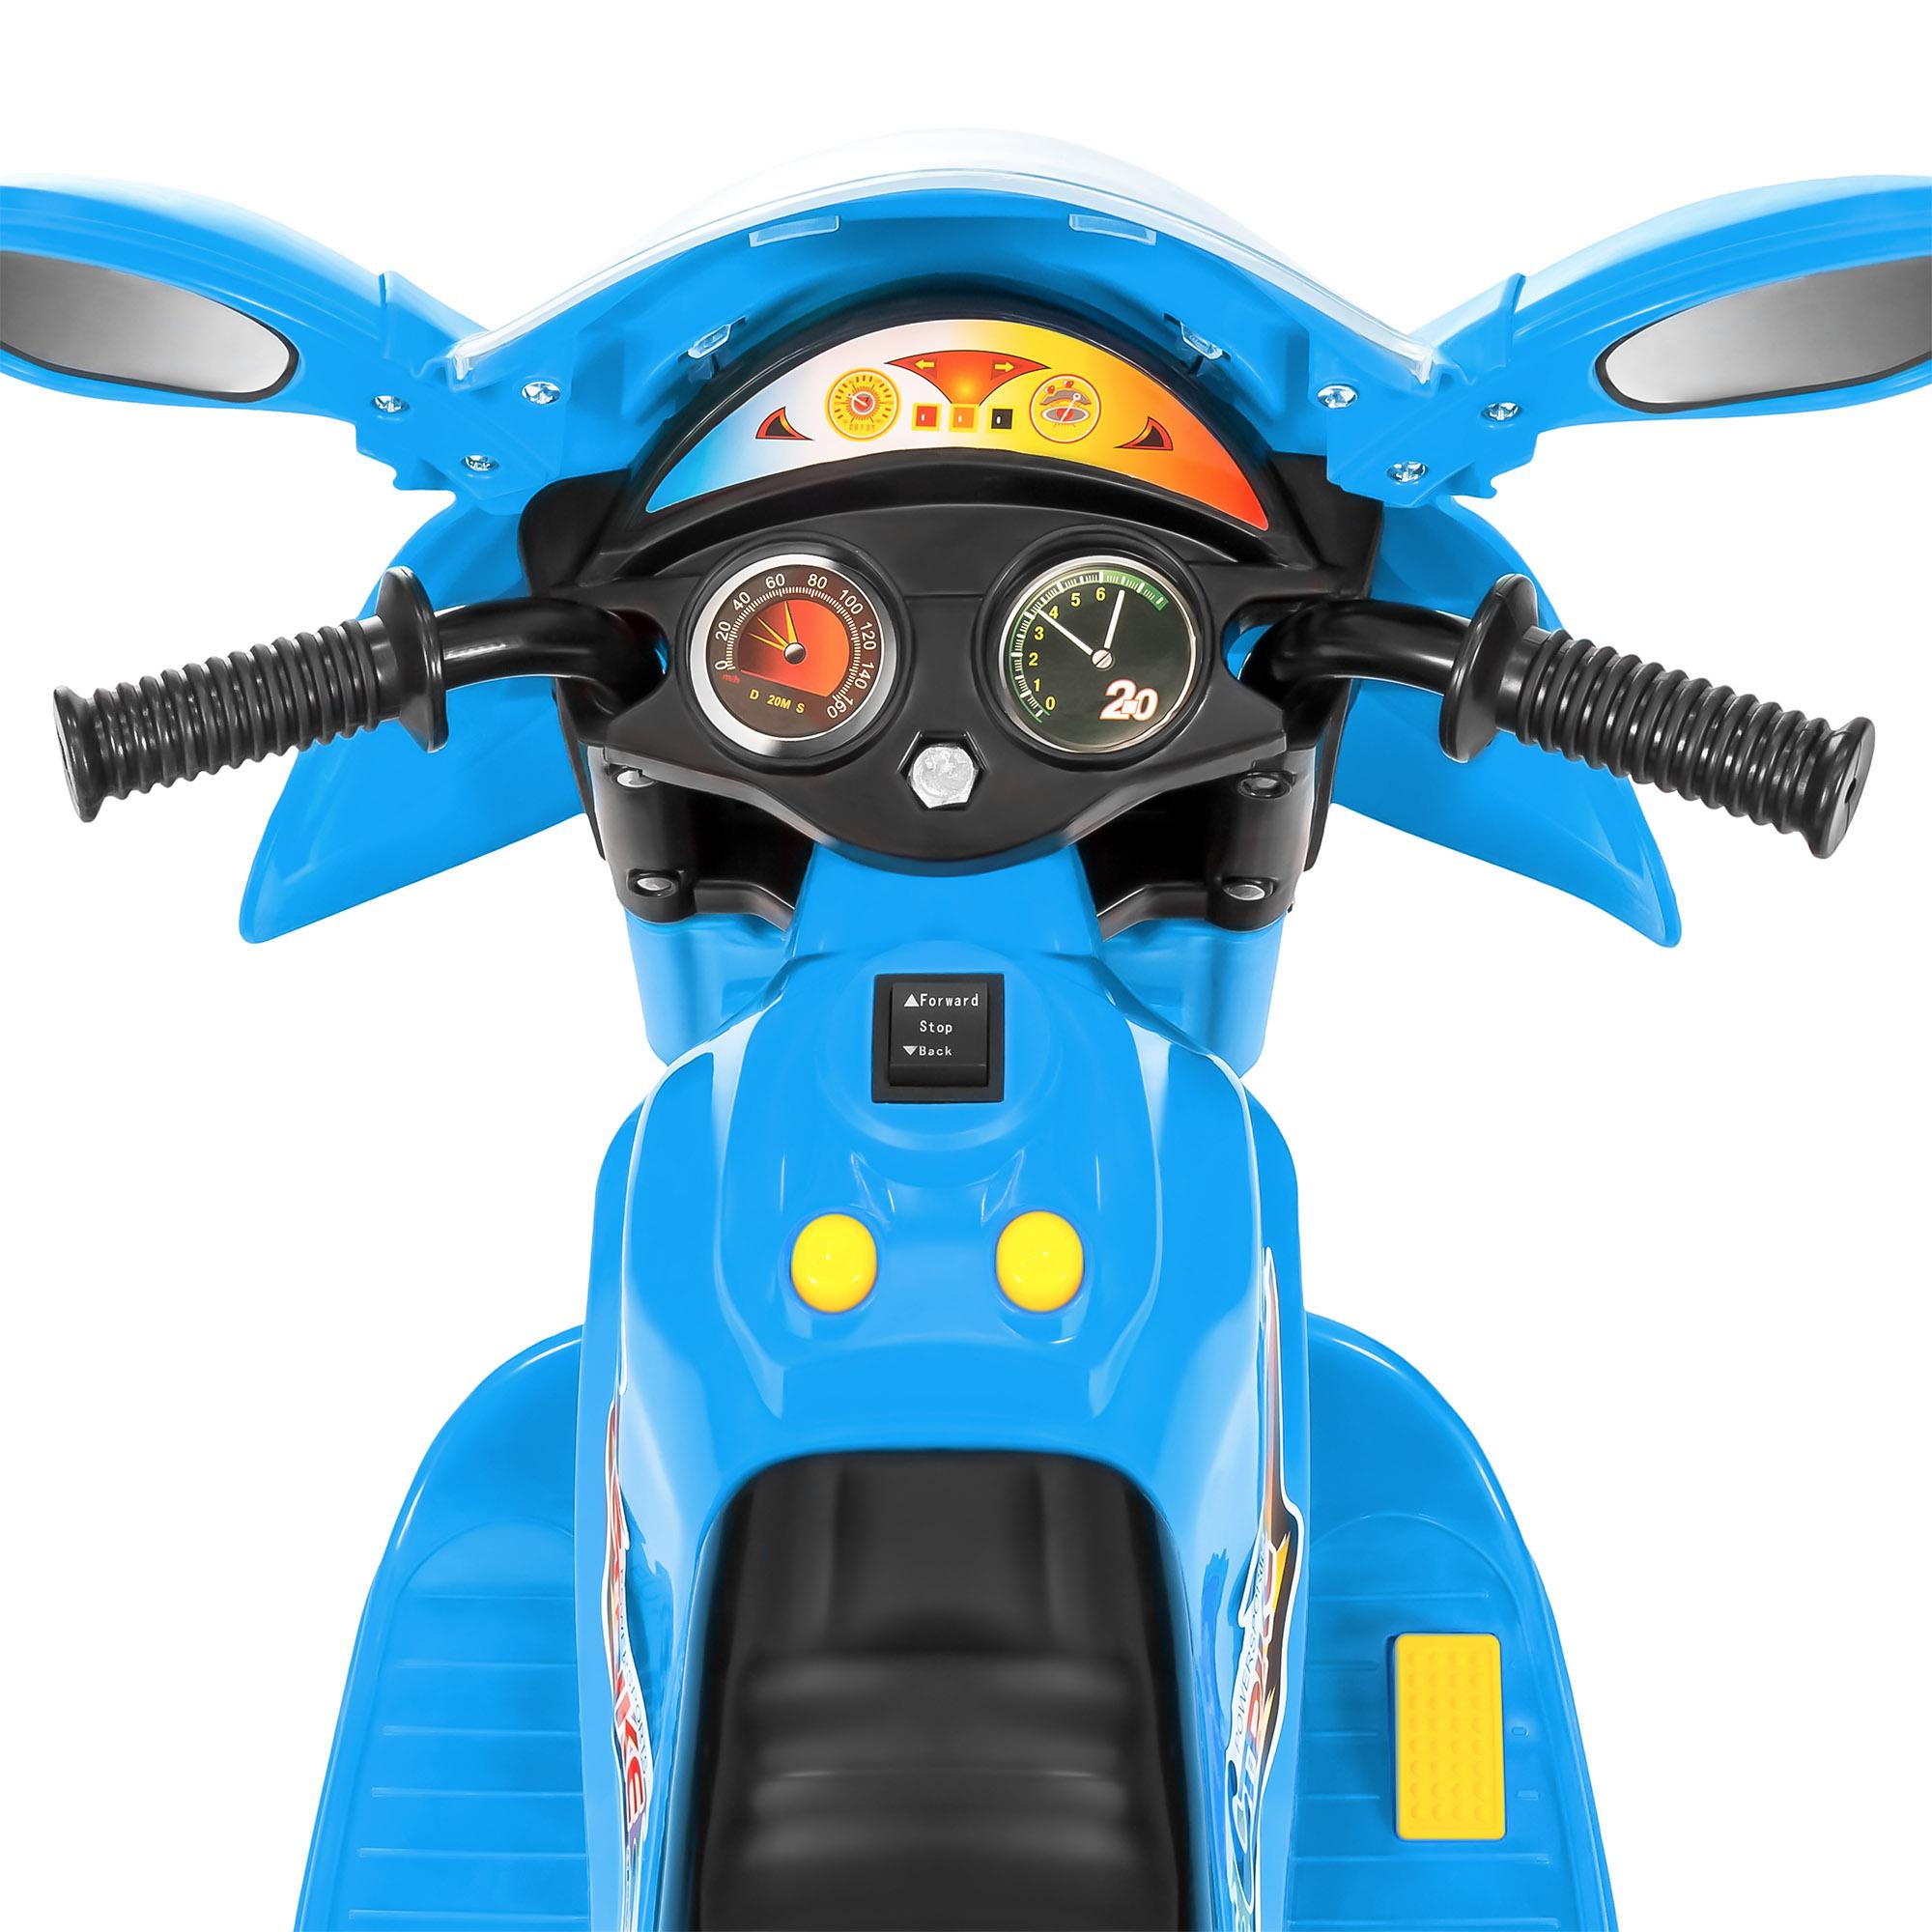 BCP-6V-Kids-3-Wheel-Motorcycle-Ride-On-Toy-w-LED-Lights-Music-Storage thumbnail 17